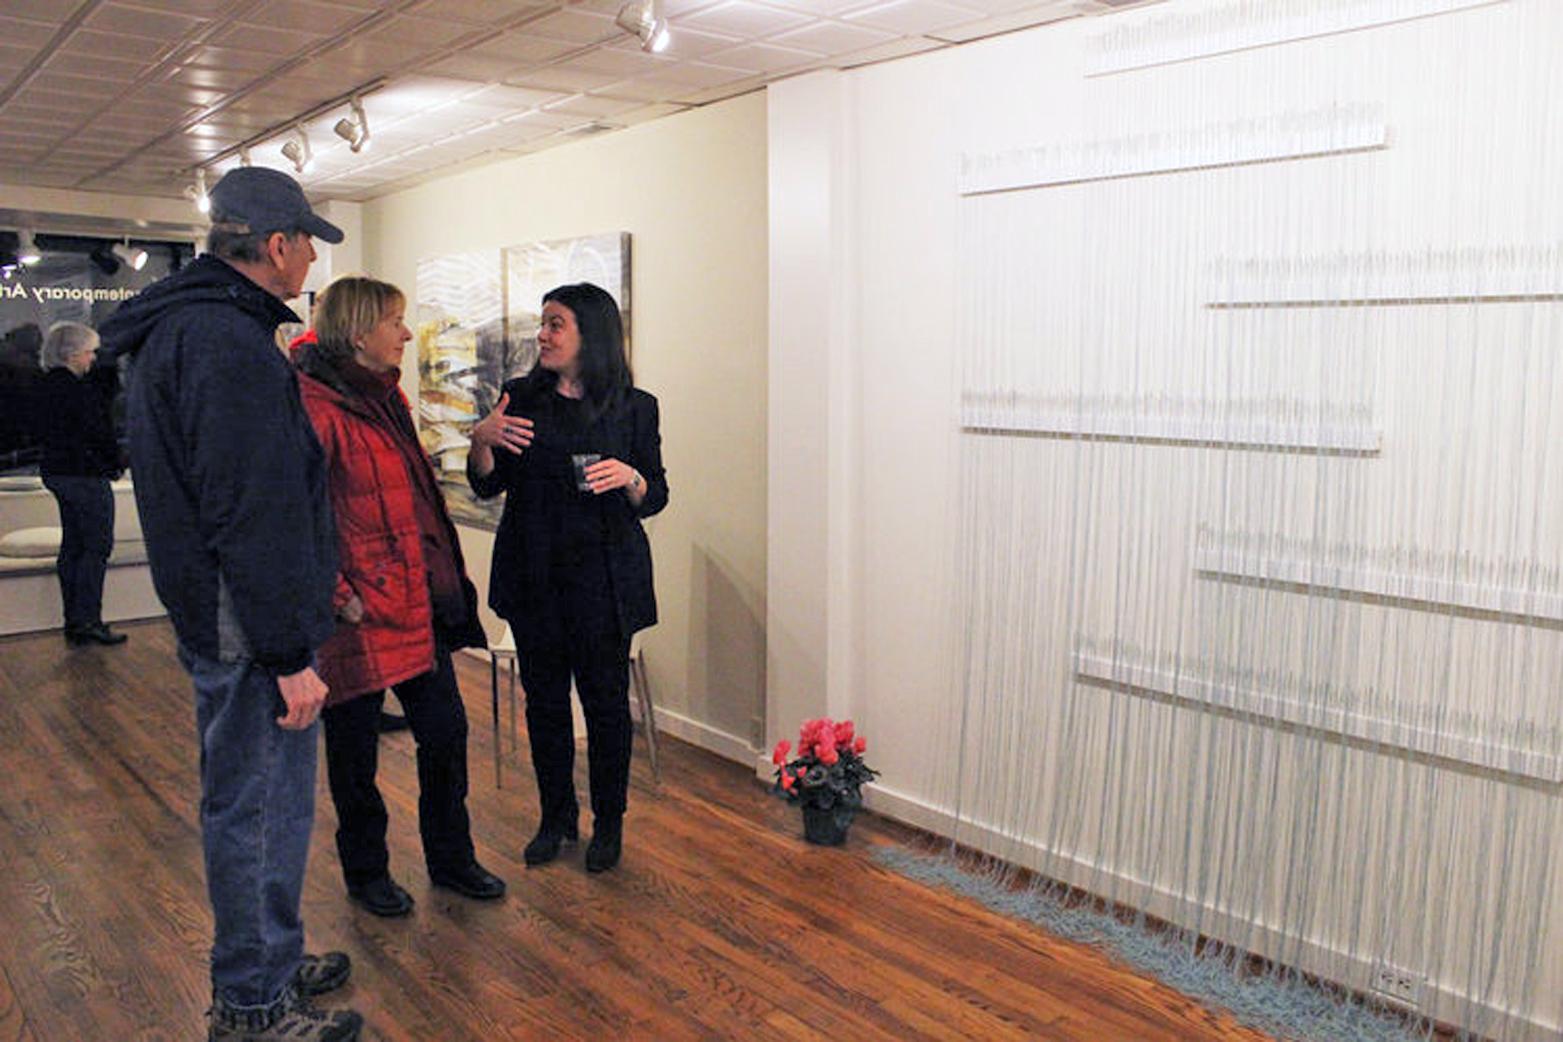 Nicole Salimbene sharing her work with guests